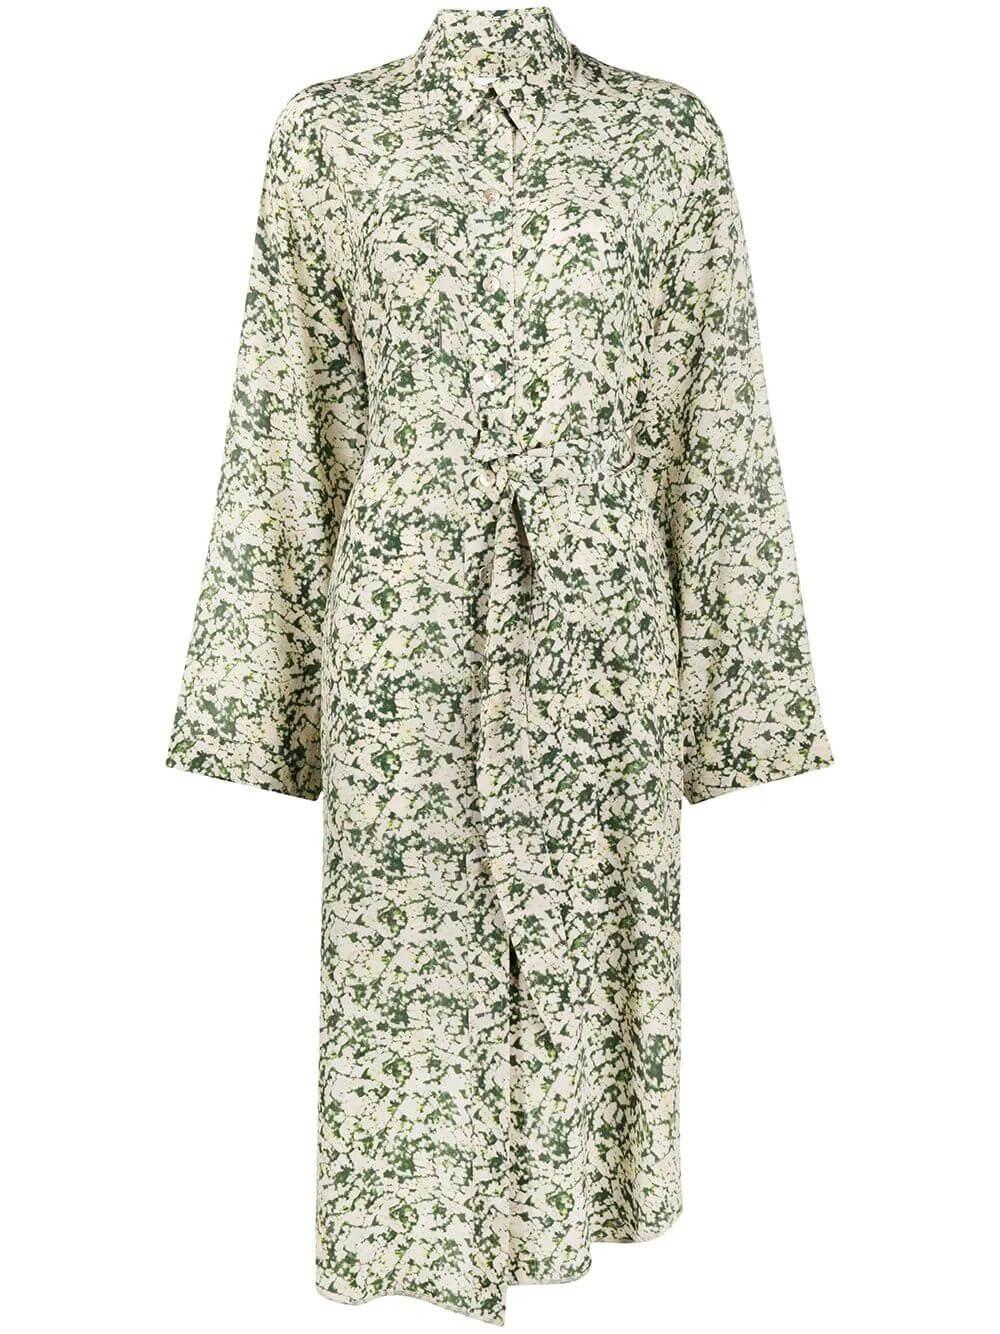 Mona Printed Shirt Dress Item # WDR00269